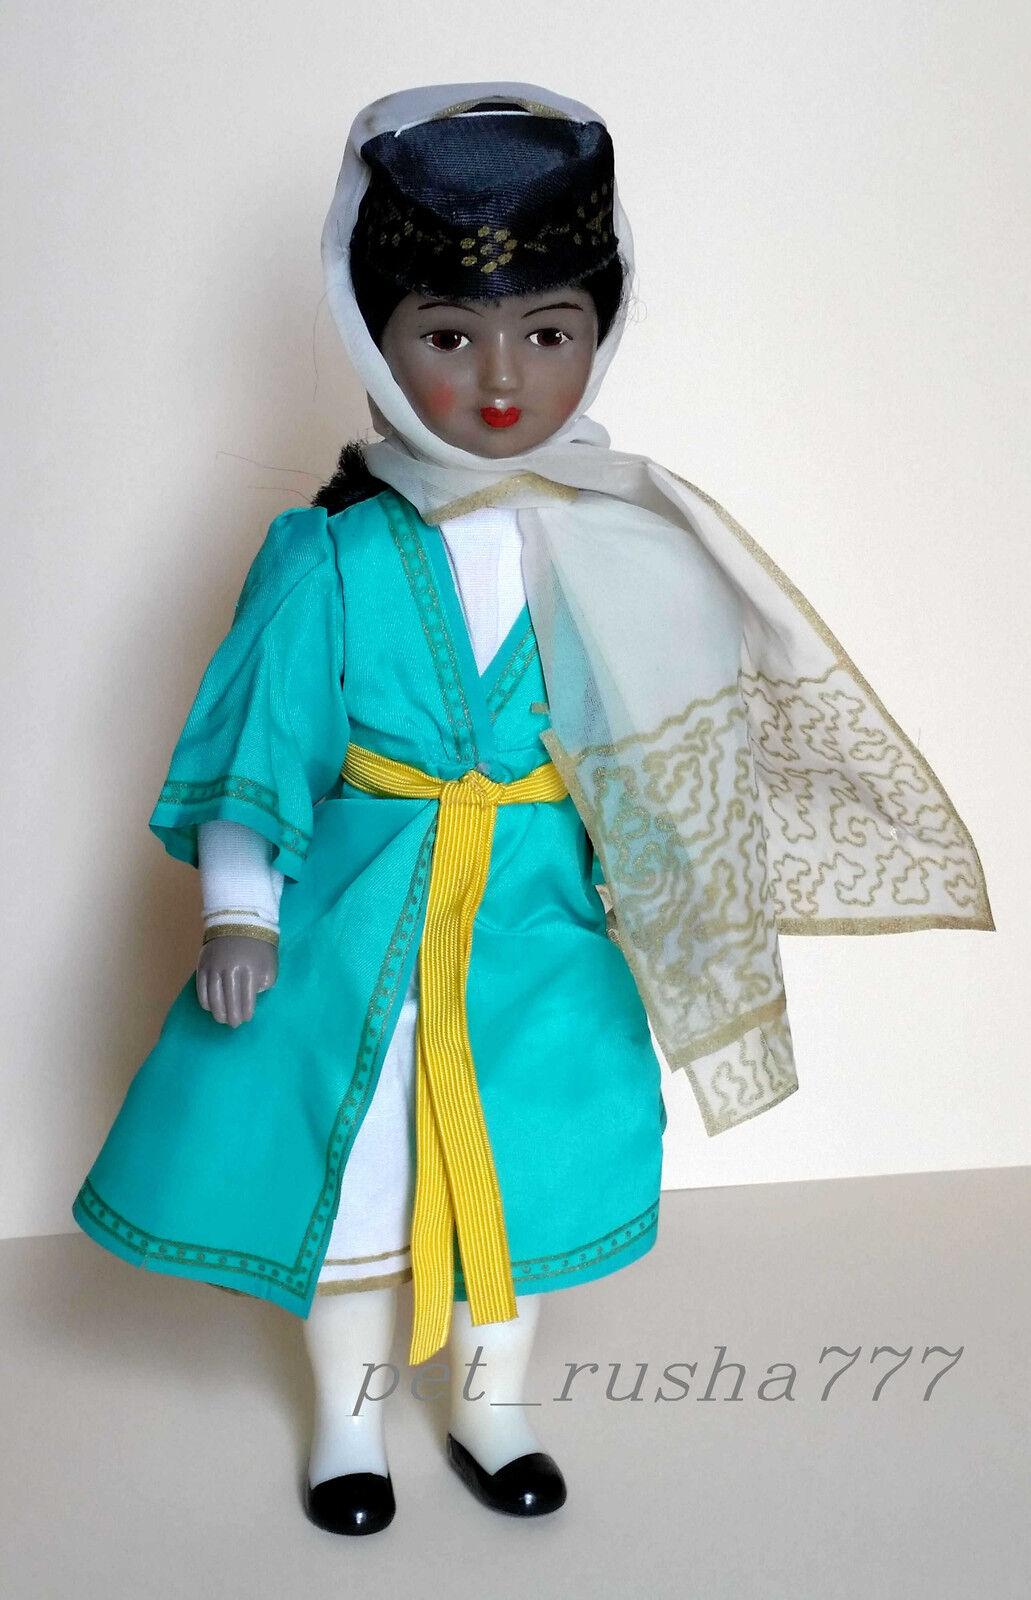 Años 70 Urss Rusa Soviética Plástico Folk georgiano Muñeca artista Marianna motovilova